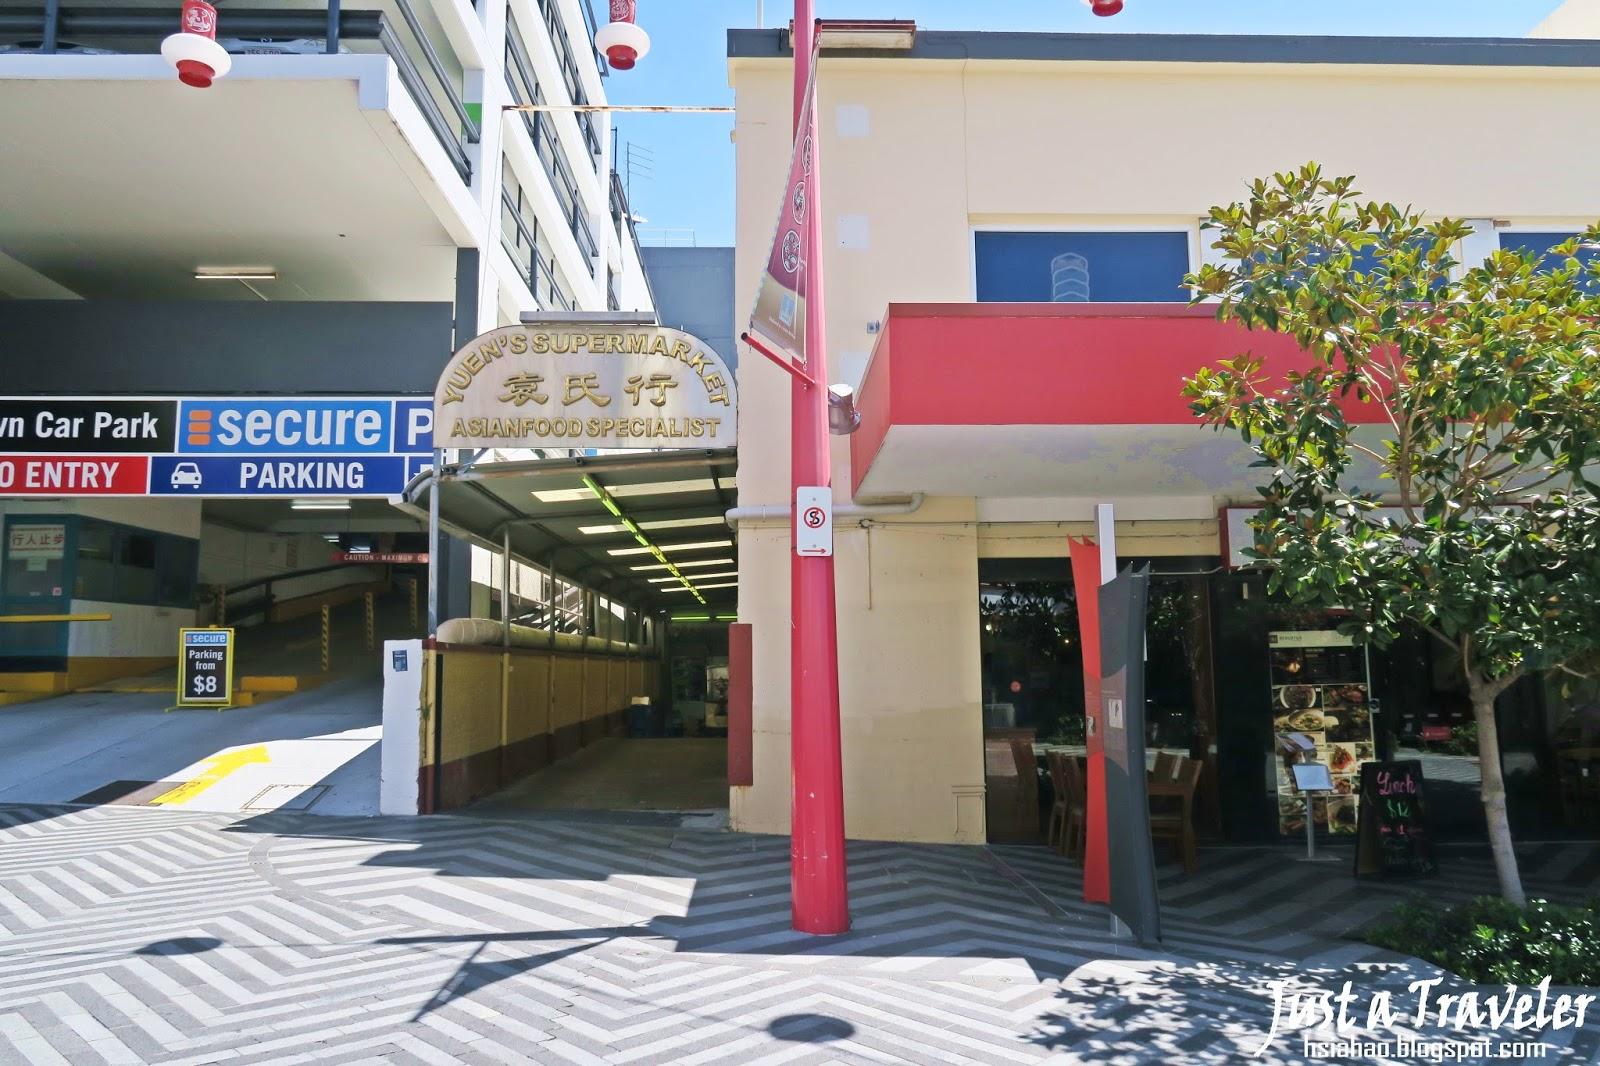 布里斯本-景點-推薦-美食-中國城-亞洲超市-旅遊-自由行-澳洲-Brisbane-Fortitude-Valley-Tourist-Attraction-Food-Travel-Australia